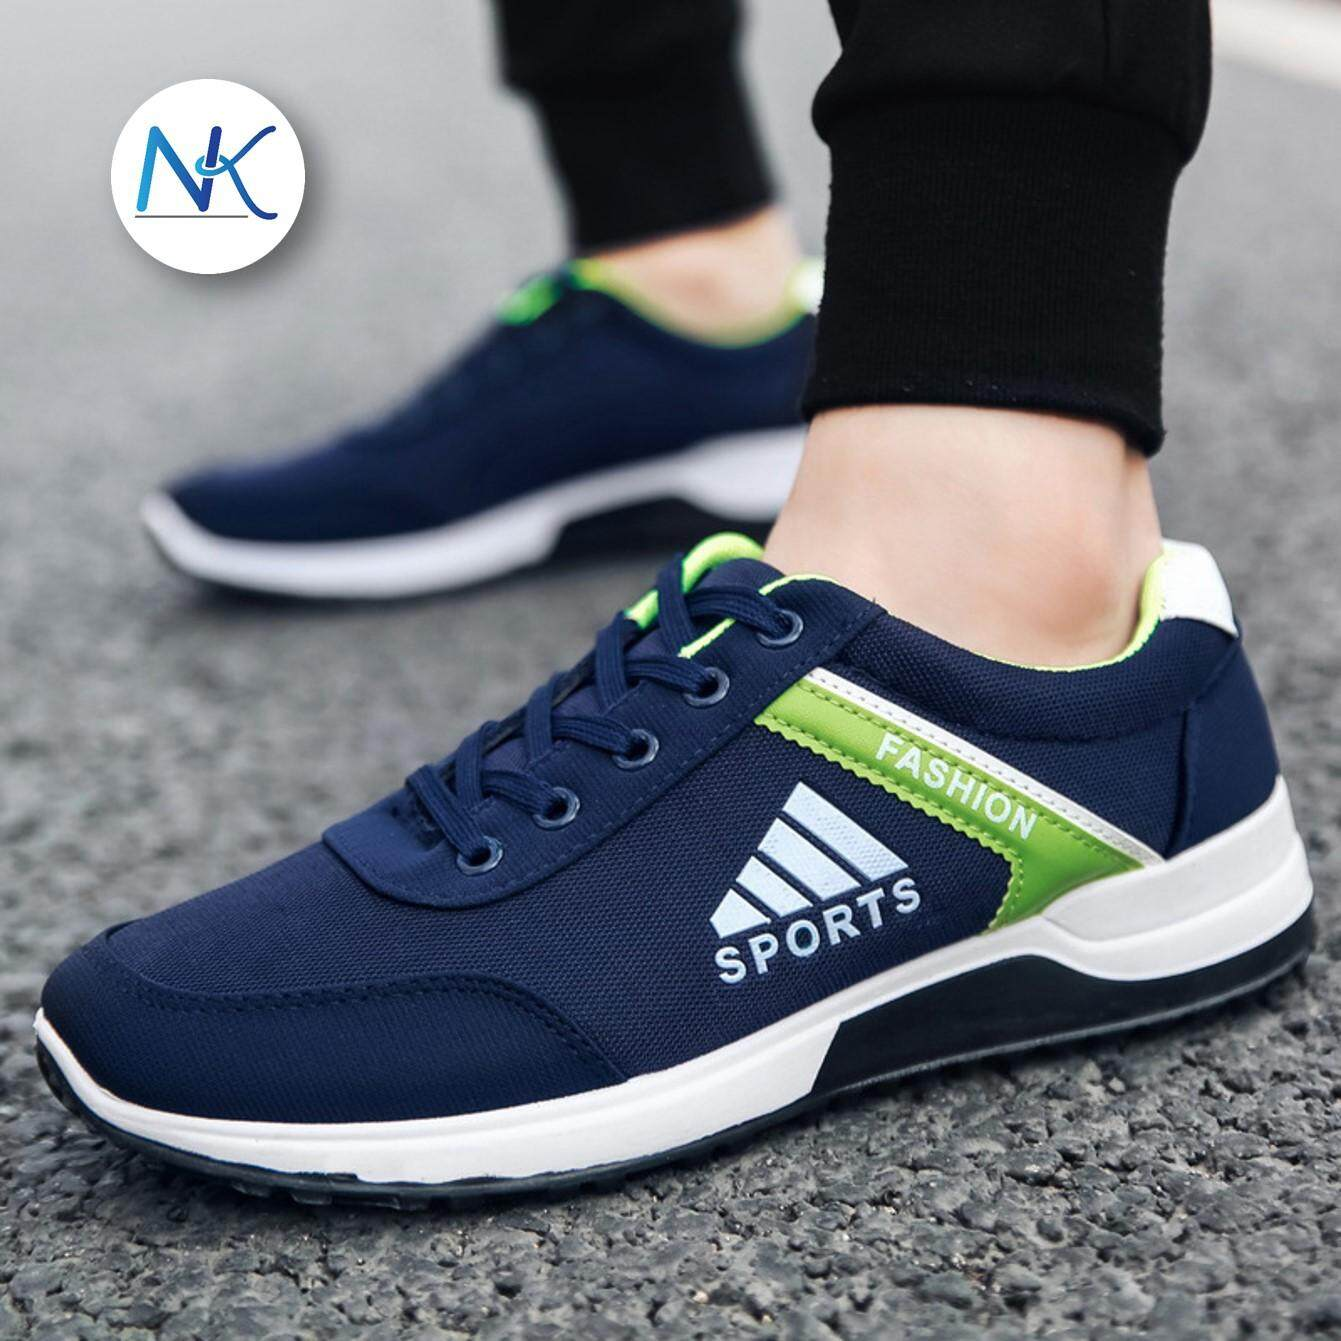 aliyahshop รองเท้าผ้าใบผู้ชาย  สไตล์ SPORTS